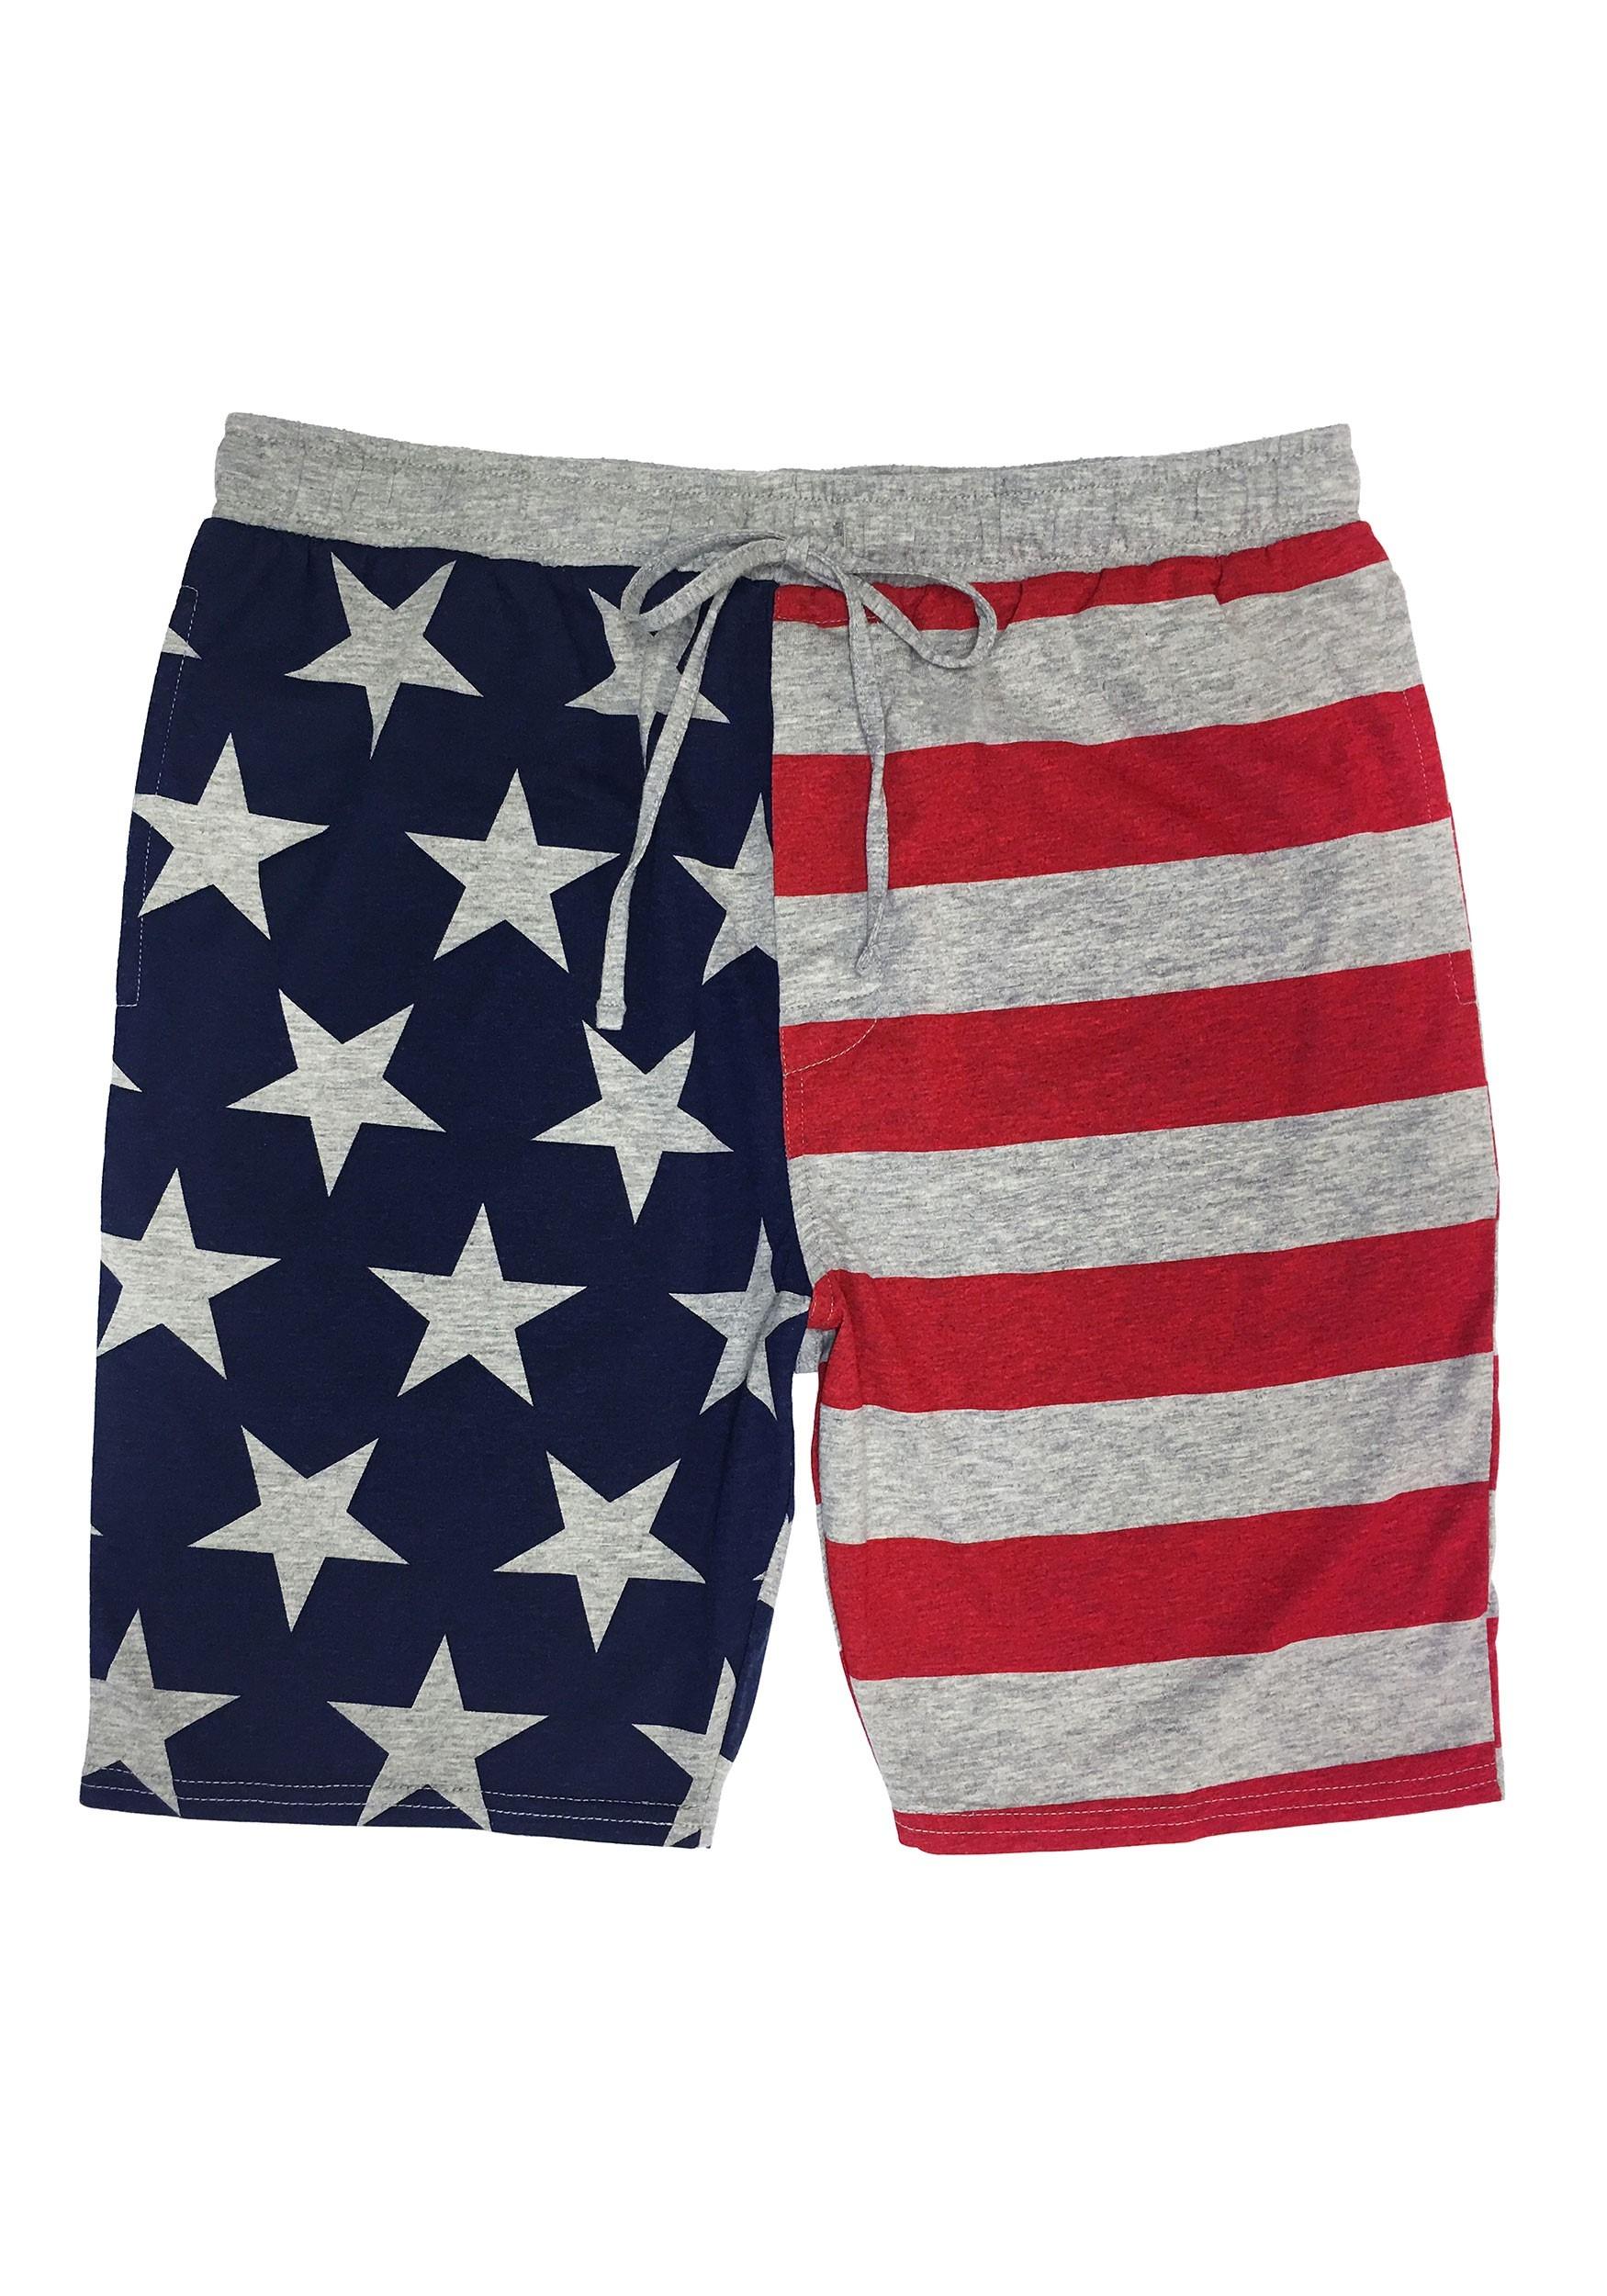 American Flag Drawstring Heather Gray Sleep Shorts